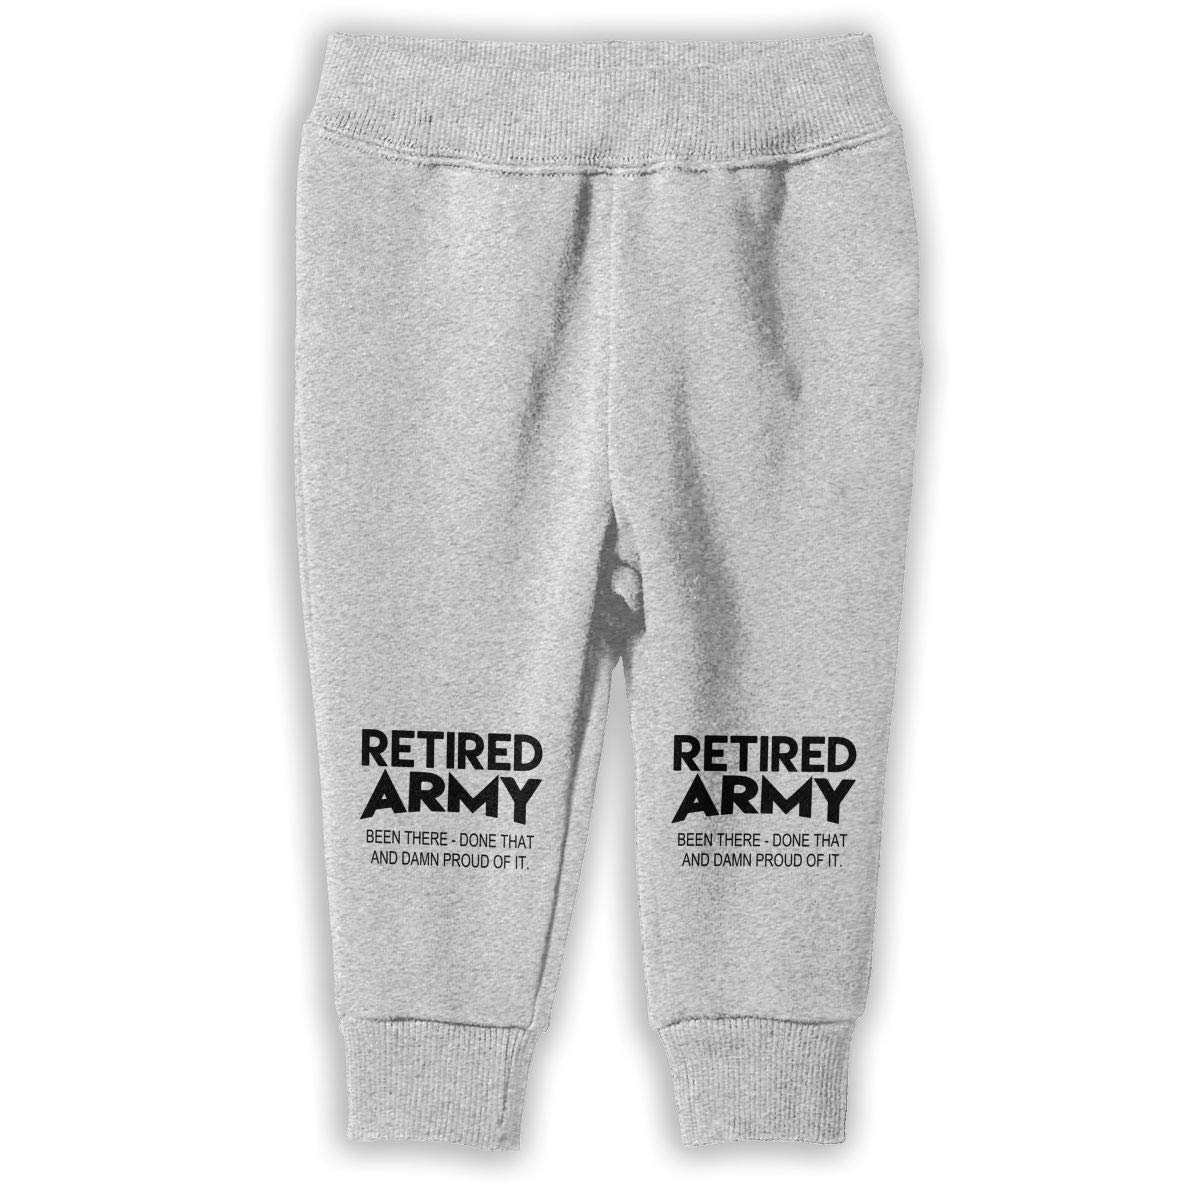 ShineFun Printed Retired Army Proud Child Boys Girls Unisex Running Sweatpants